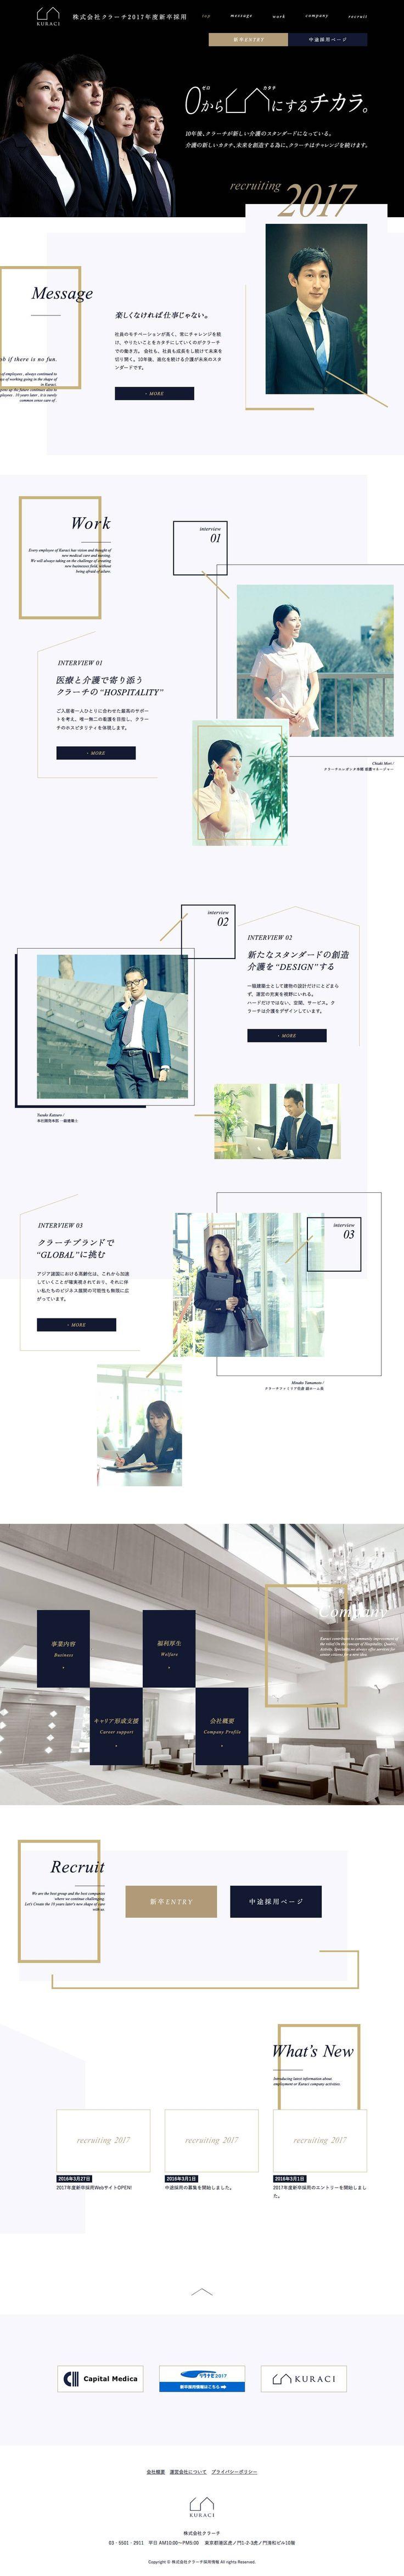 https://www.kuraci.co.jp/recruit/index.html#